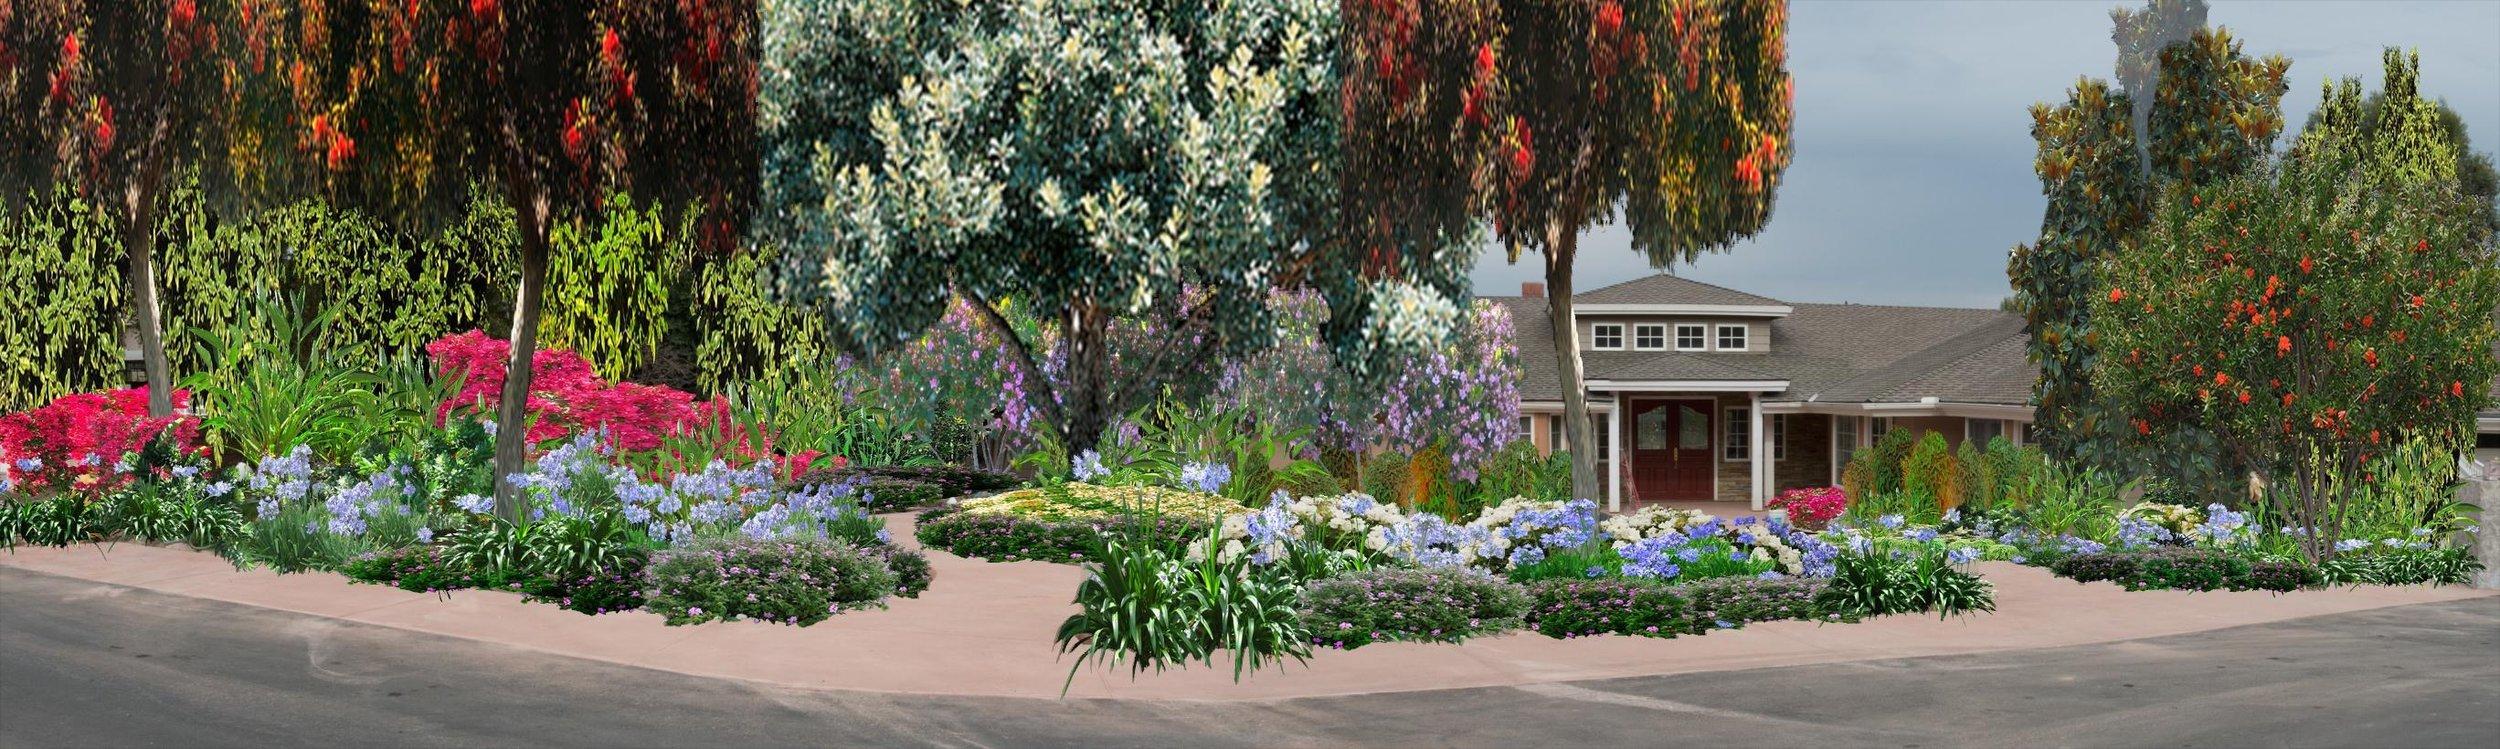 Front Yard, Design Rendering  Orange, California